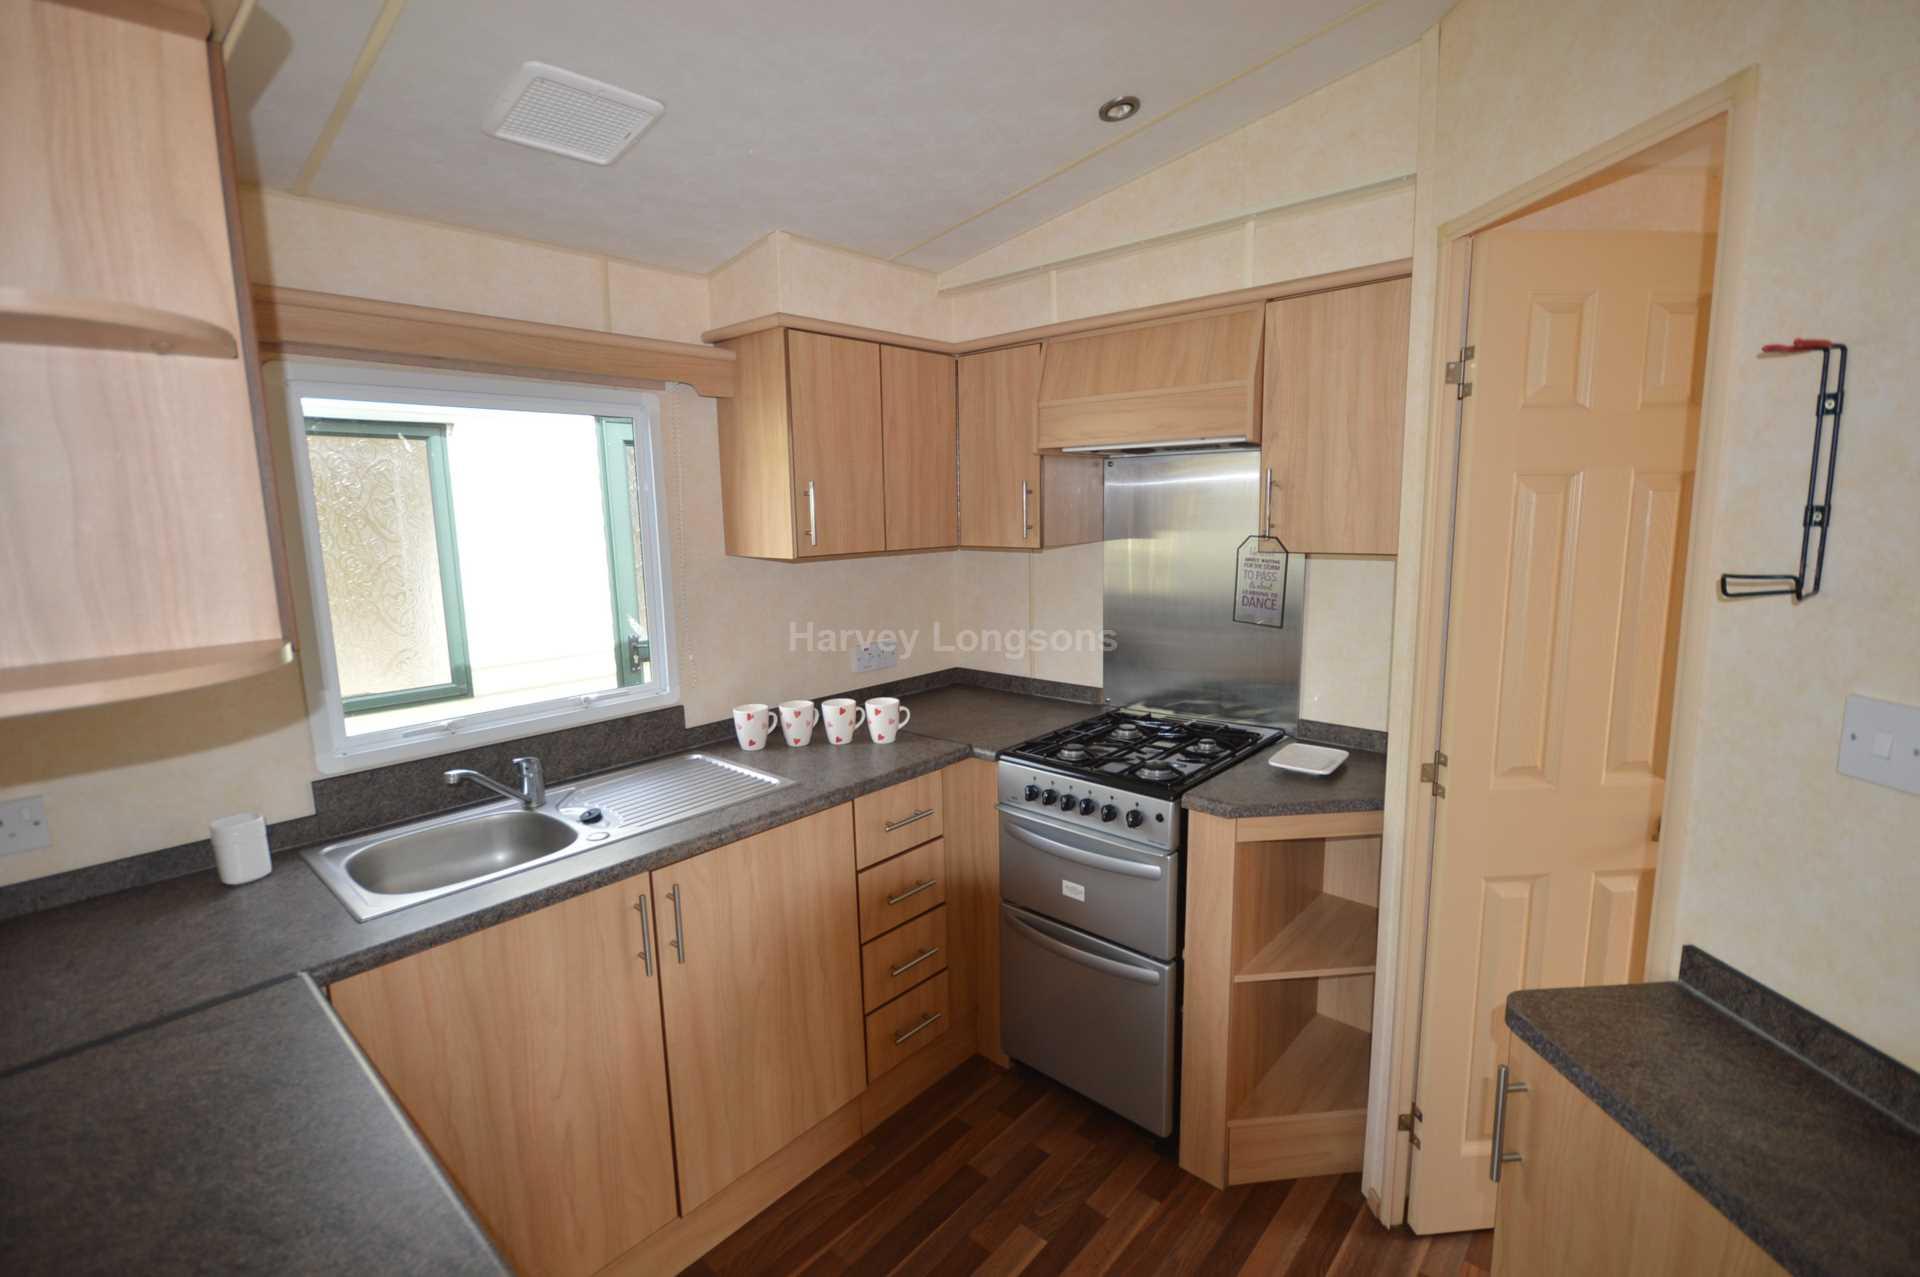 Simple Bedroom Caravan For Sale Harts Holiday Park Leysdown Road Leysdown